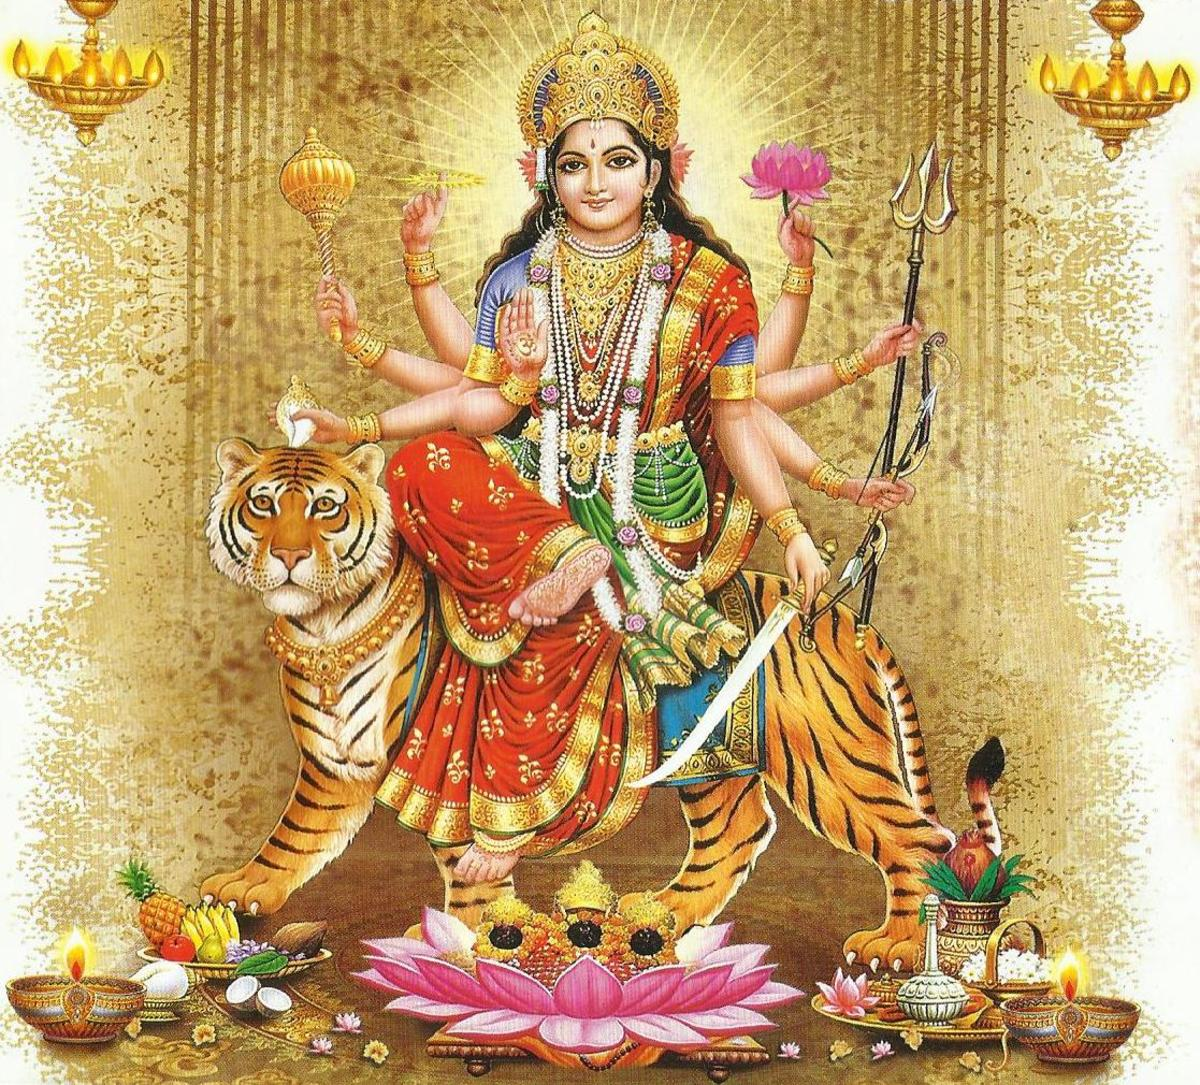 Mantras of Goddess Durga - The Universal Mother